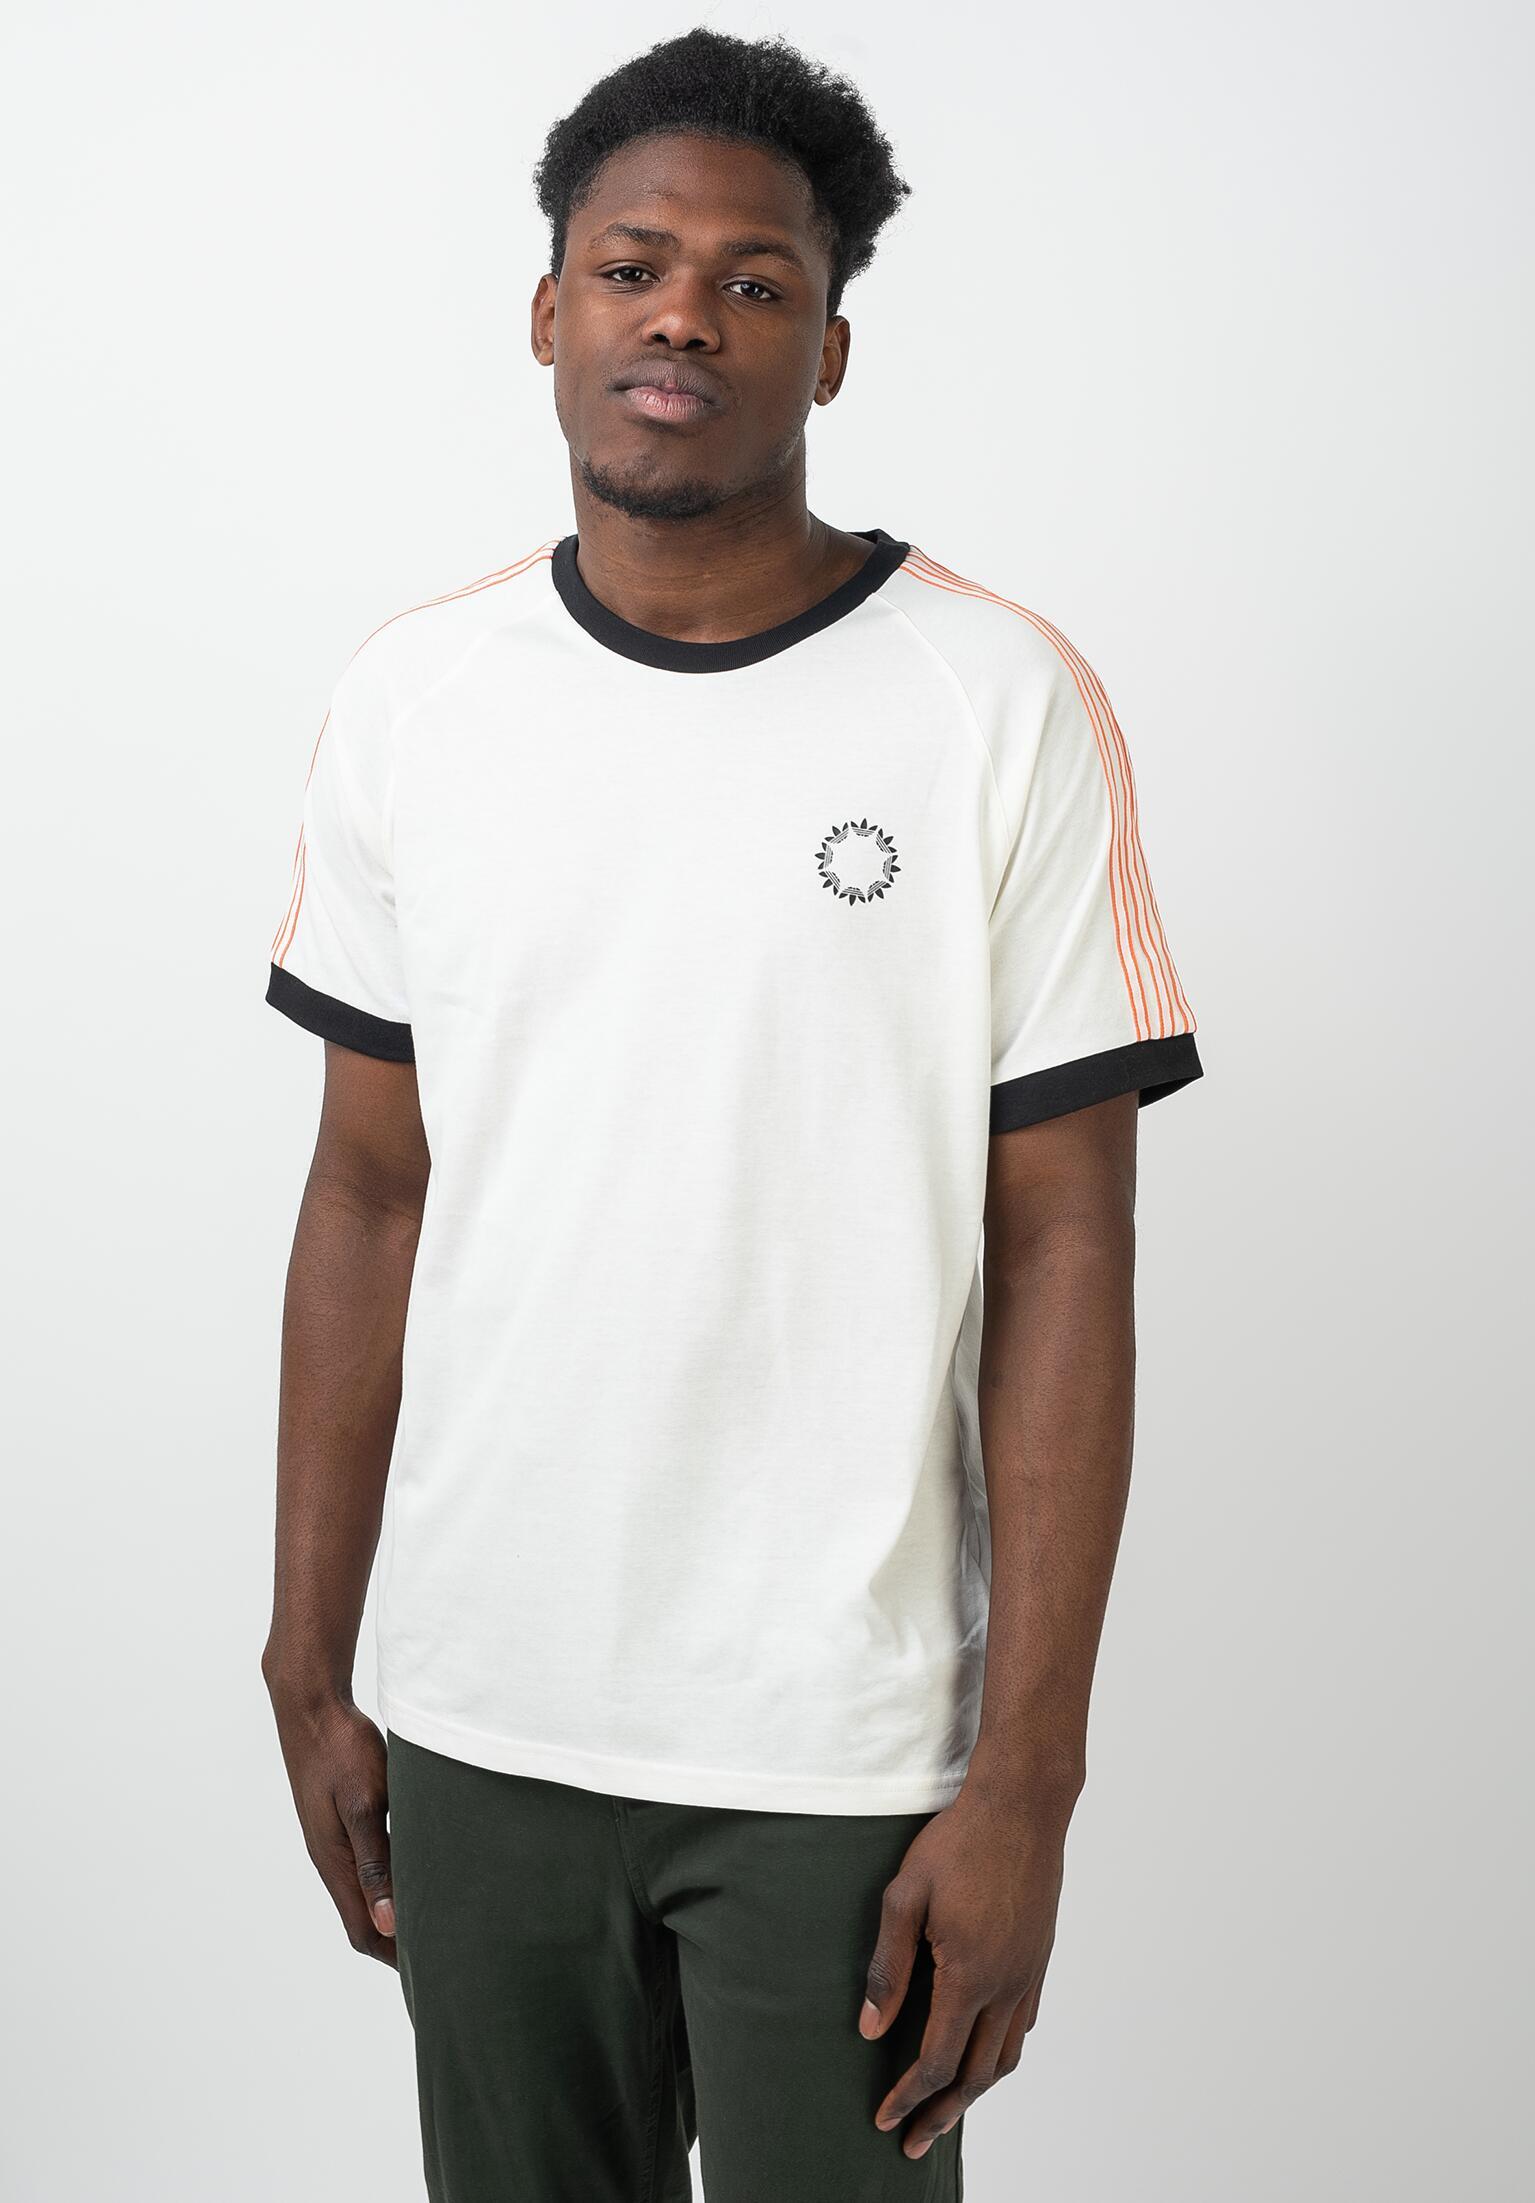 off white adidas shirt online